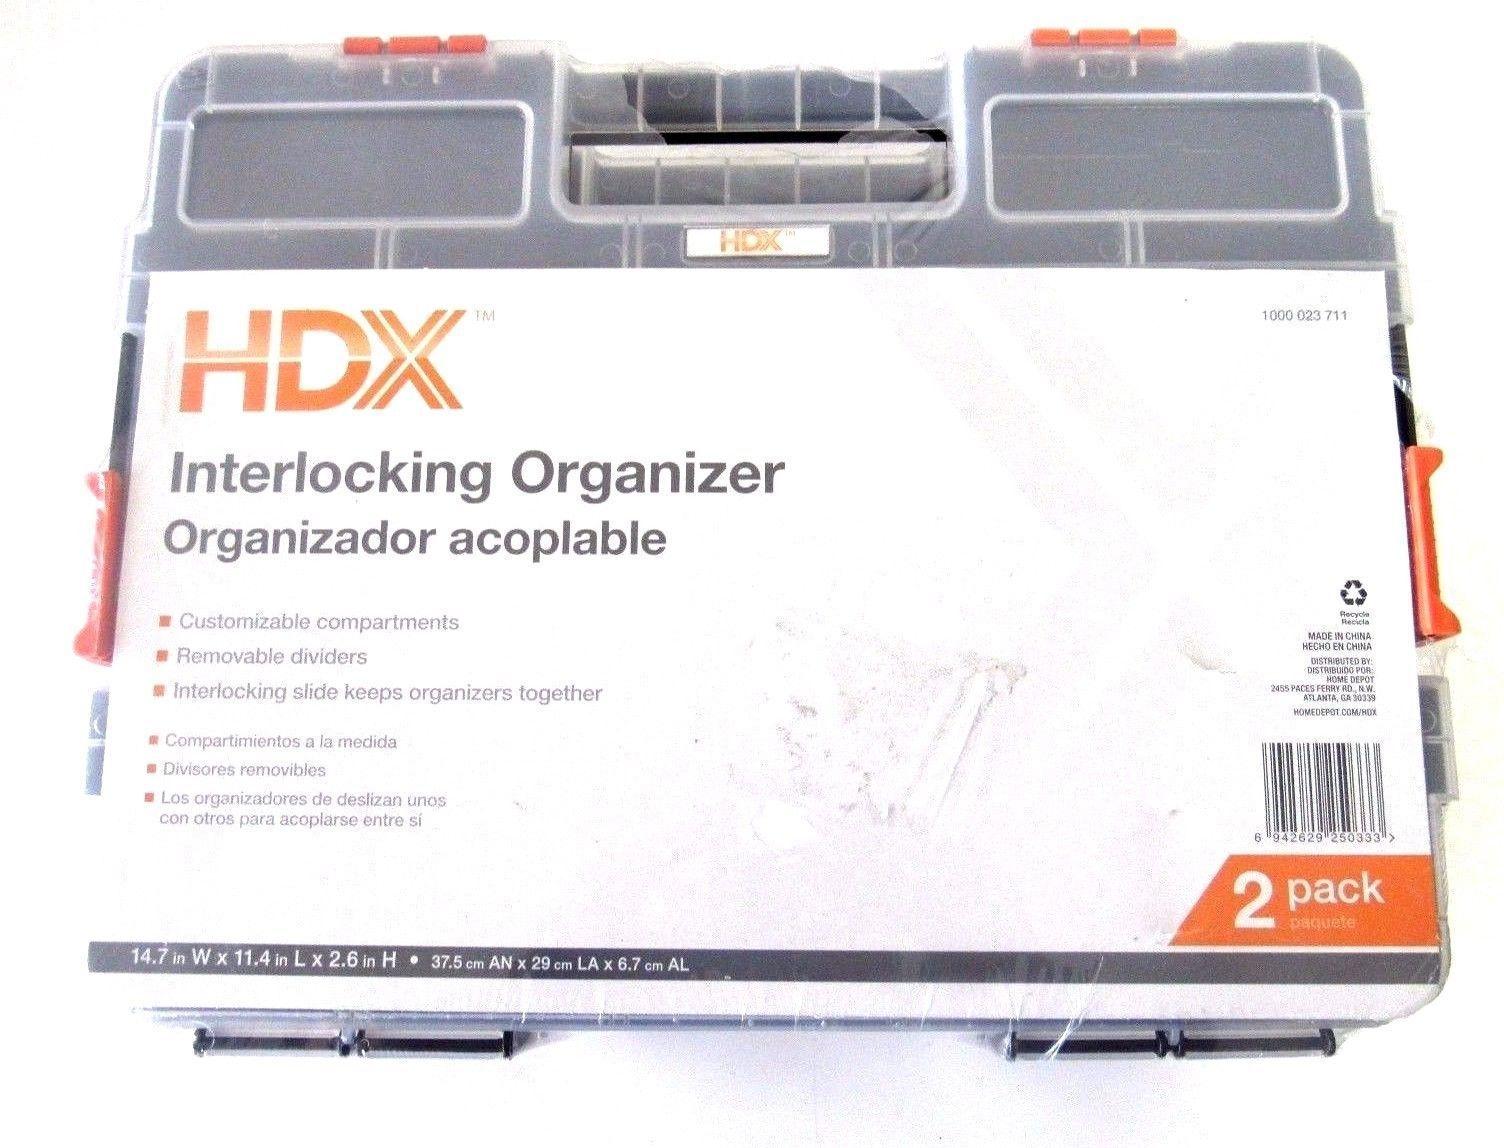 6-Pack HDX 15-Compartment Interlocking Small Parts Organizer in Black